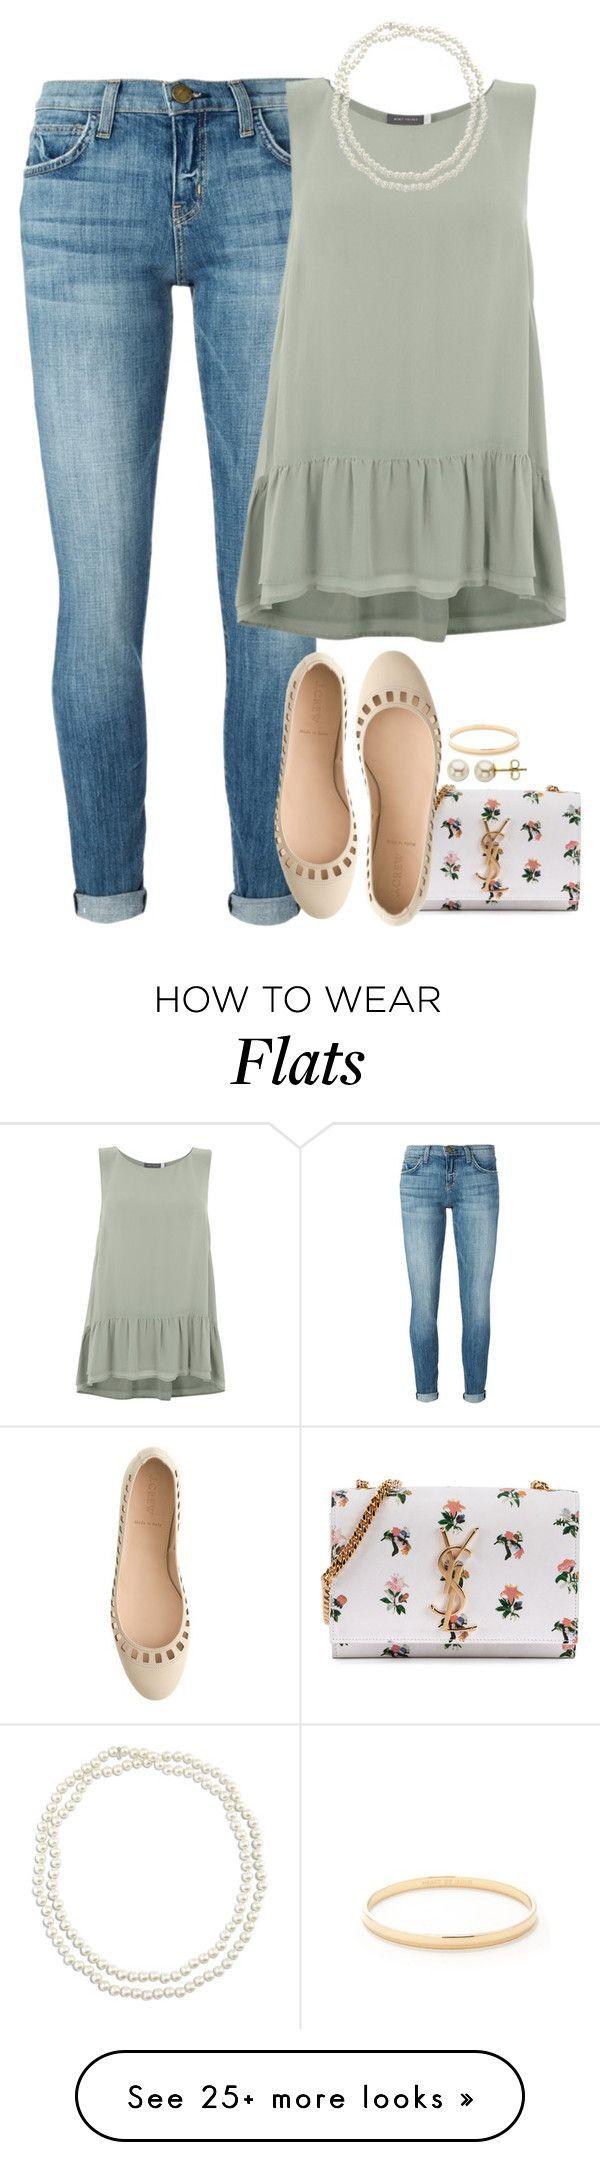 Cool Nice Dress Shoes Flats Sets Check more at http://24shopping.gq/fashion/nice-dress-shoes-flats-sets/